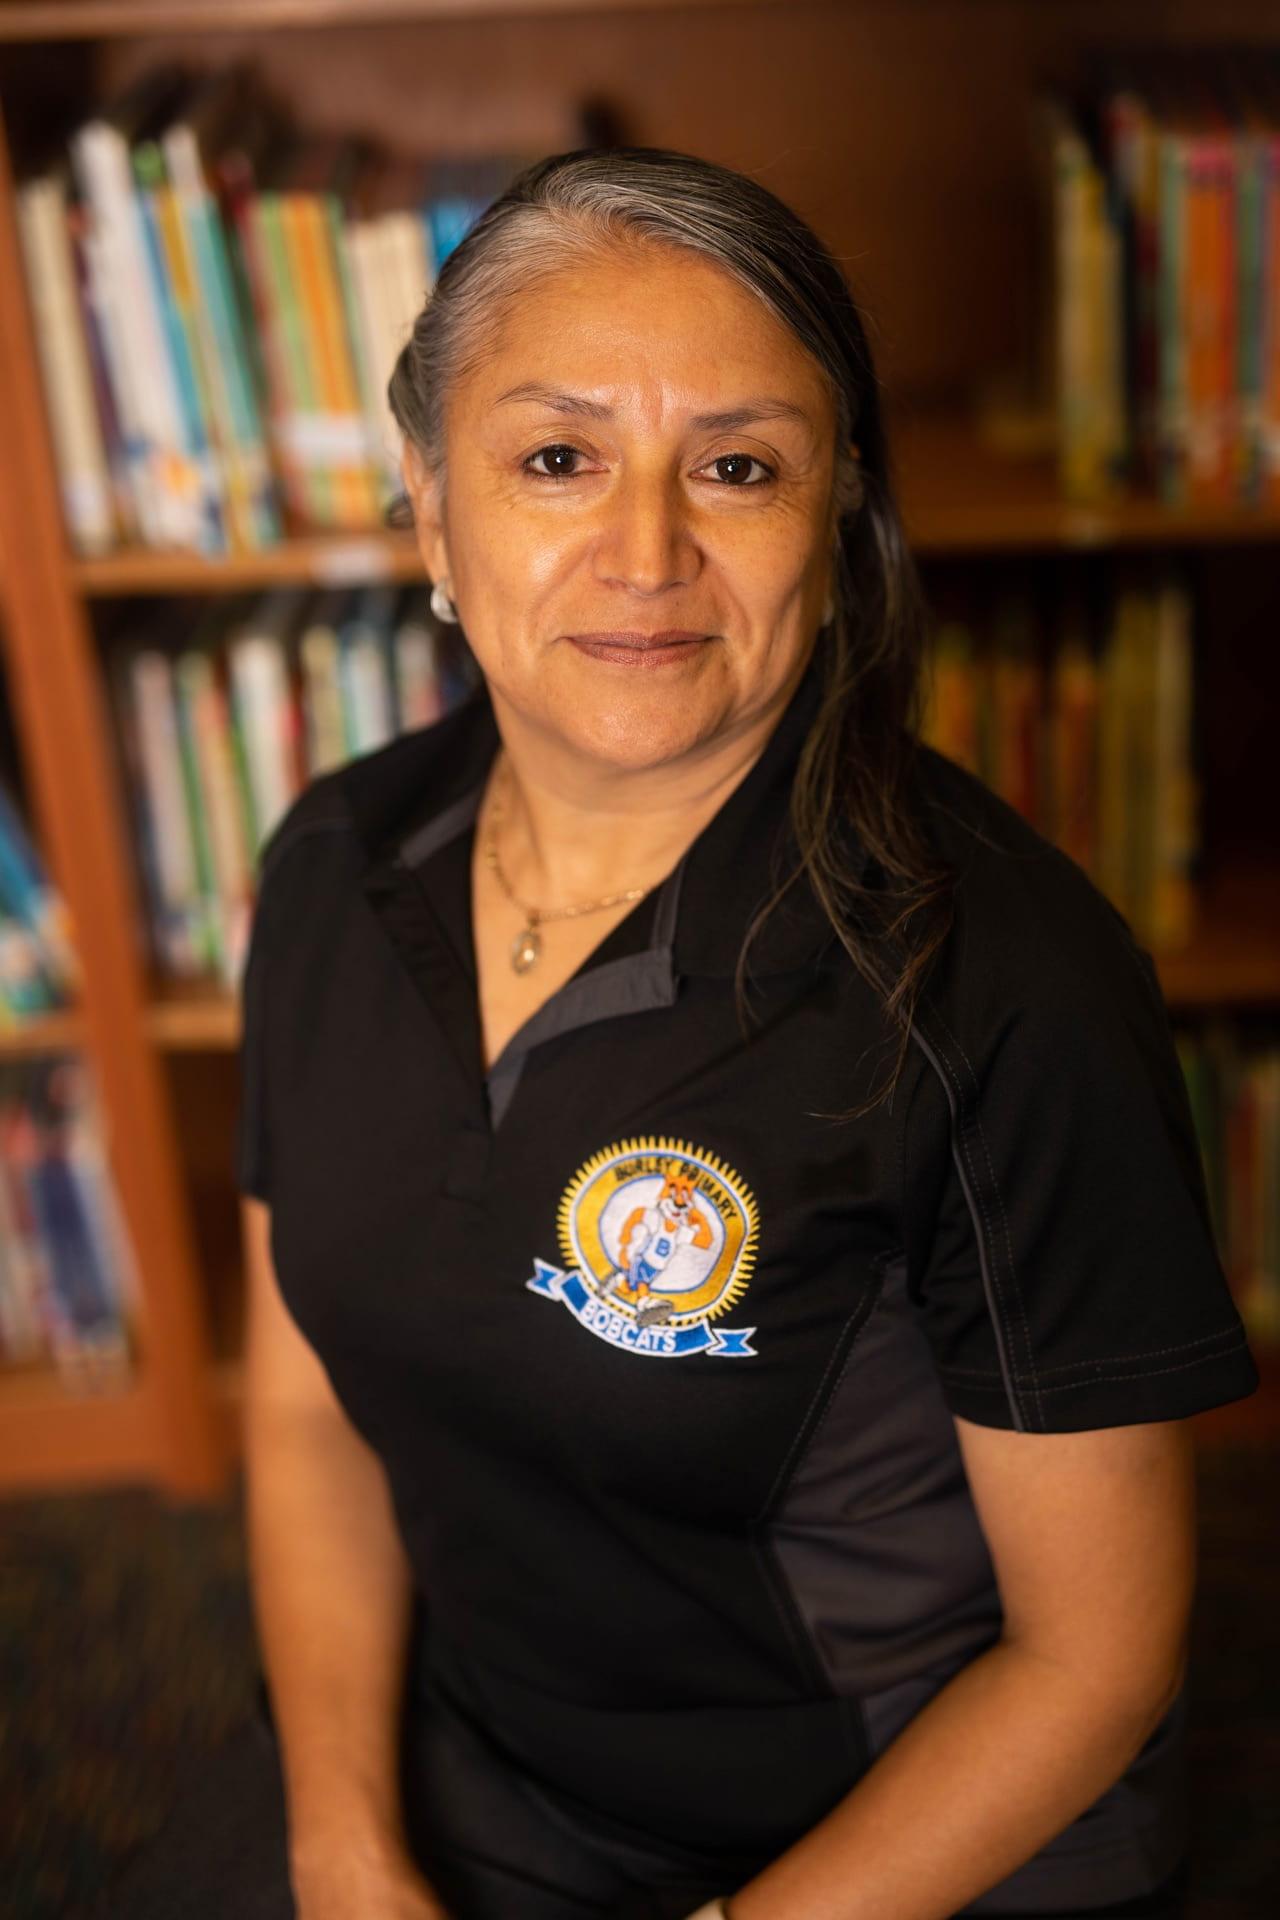 Micaela Santoyo